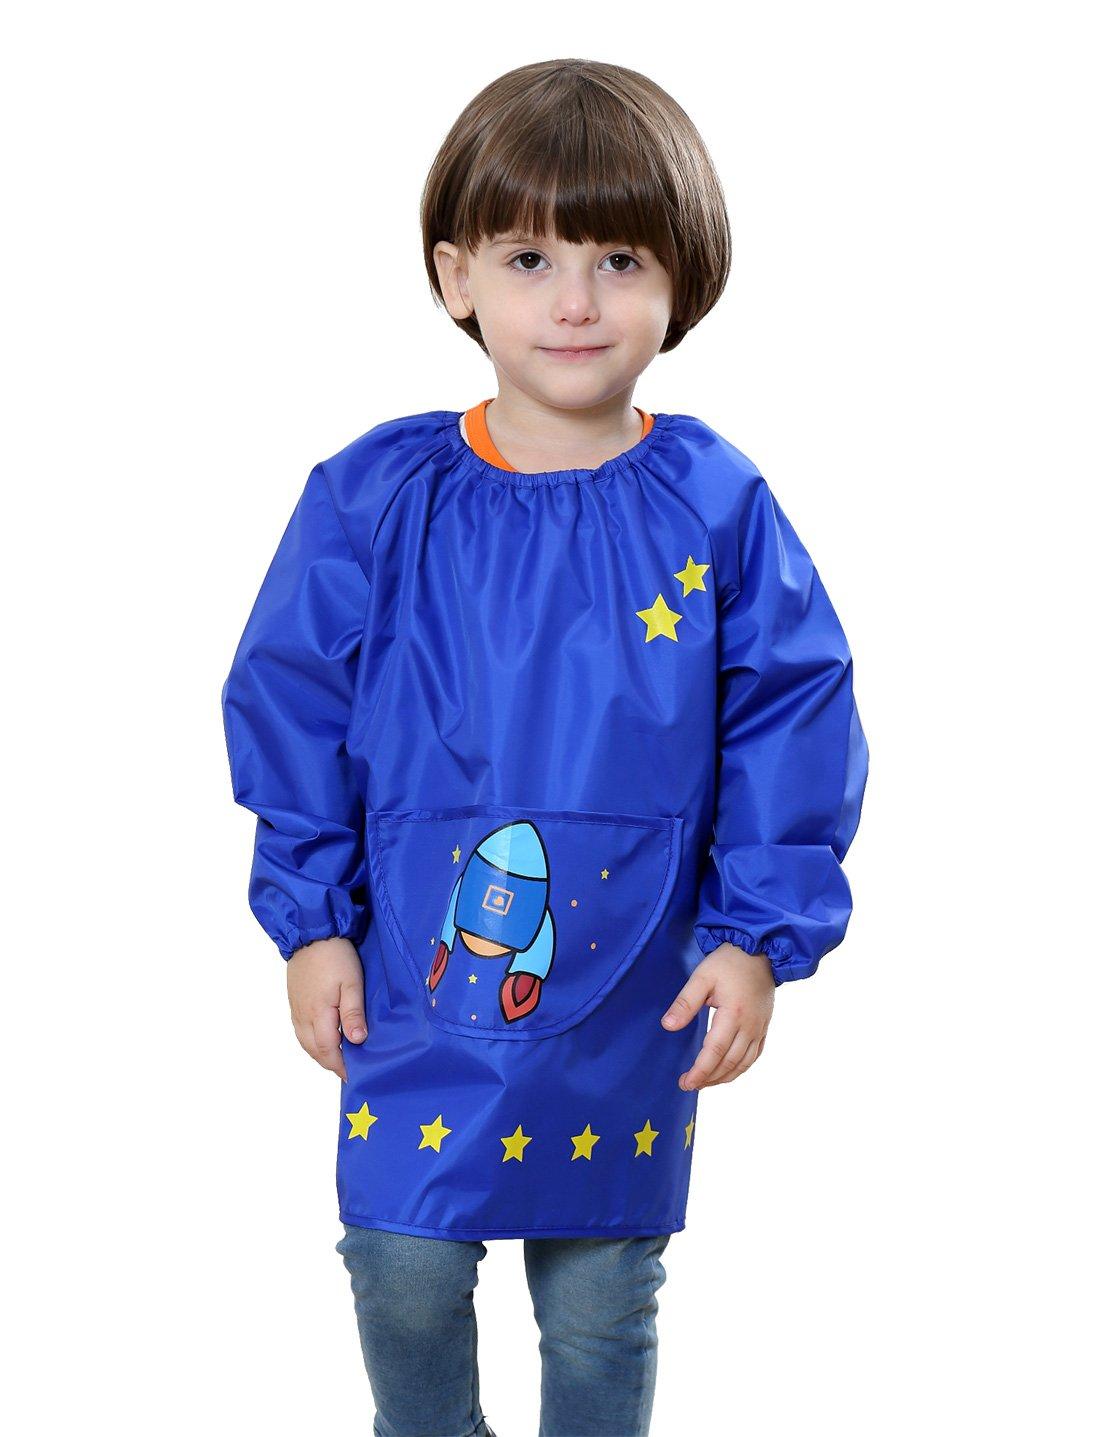 Toddler Children's Waterproof Pullover Long Sleeved Bib Smock Rocket Printing Kids Polyester Lightweight Painting Eating Apron Blue 6-10 T